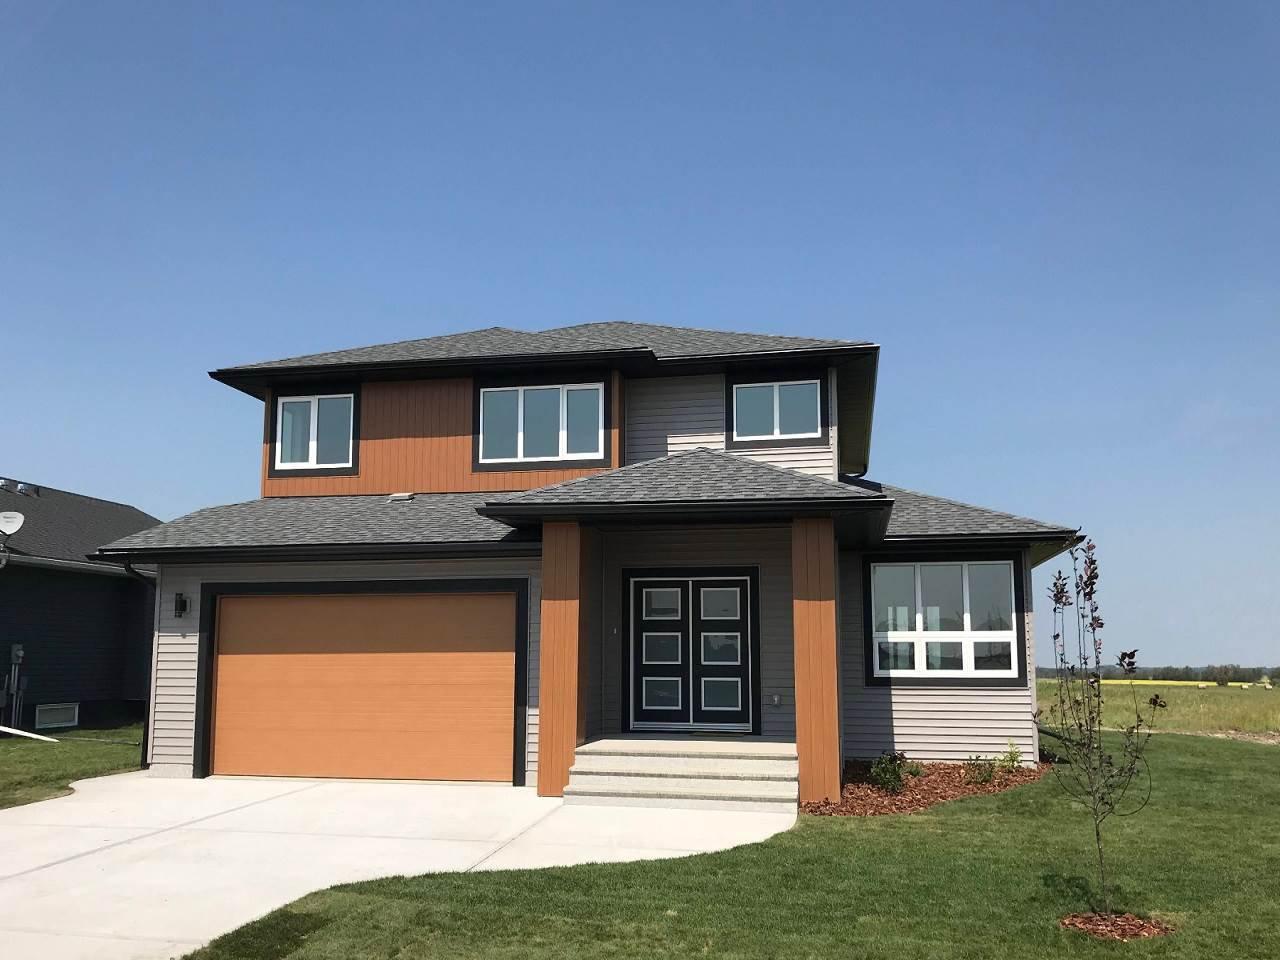 Main Photo: 11120 103 Street: Westlock House for sale : MLS®# E4149126